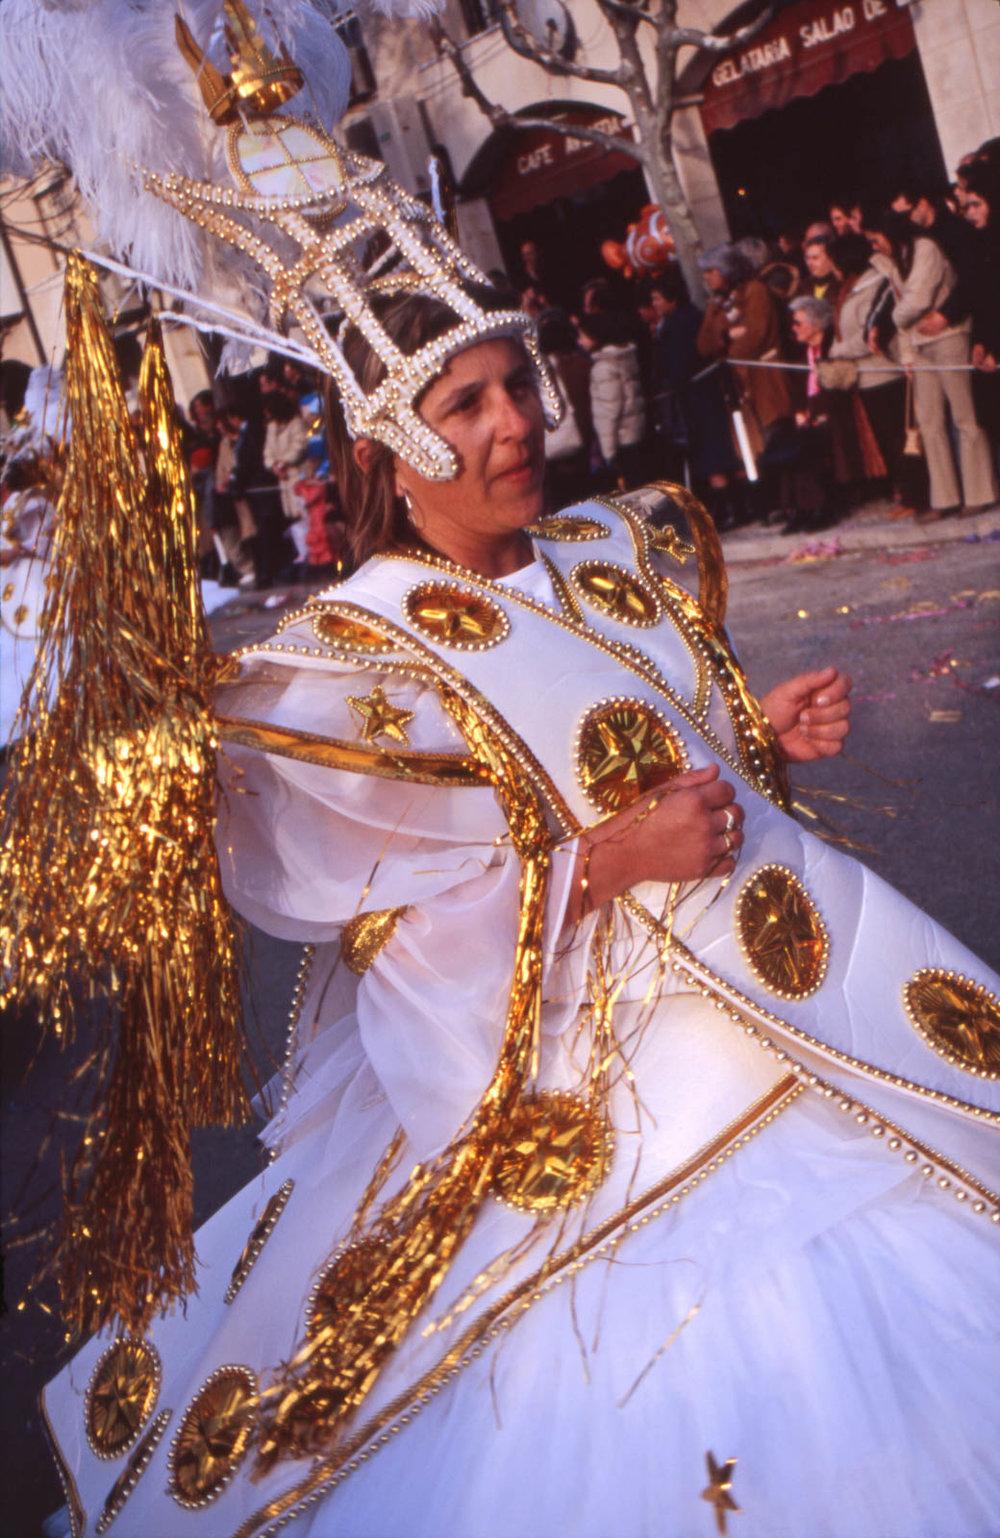 Carnaval Sesimbra desfile002.jpg